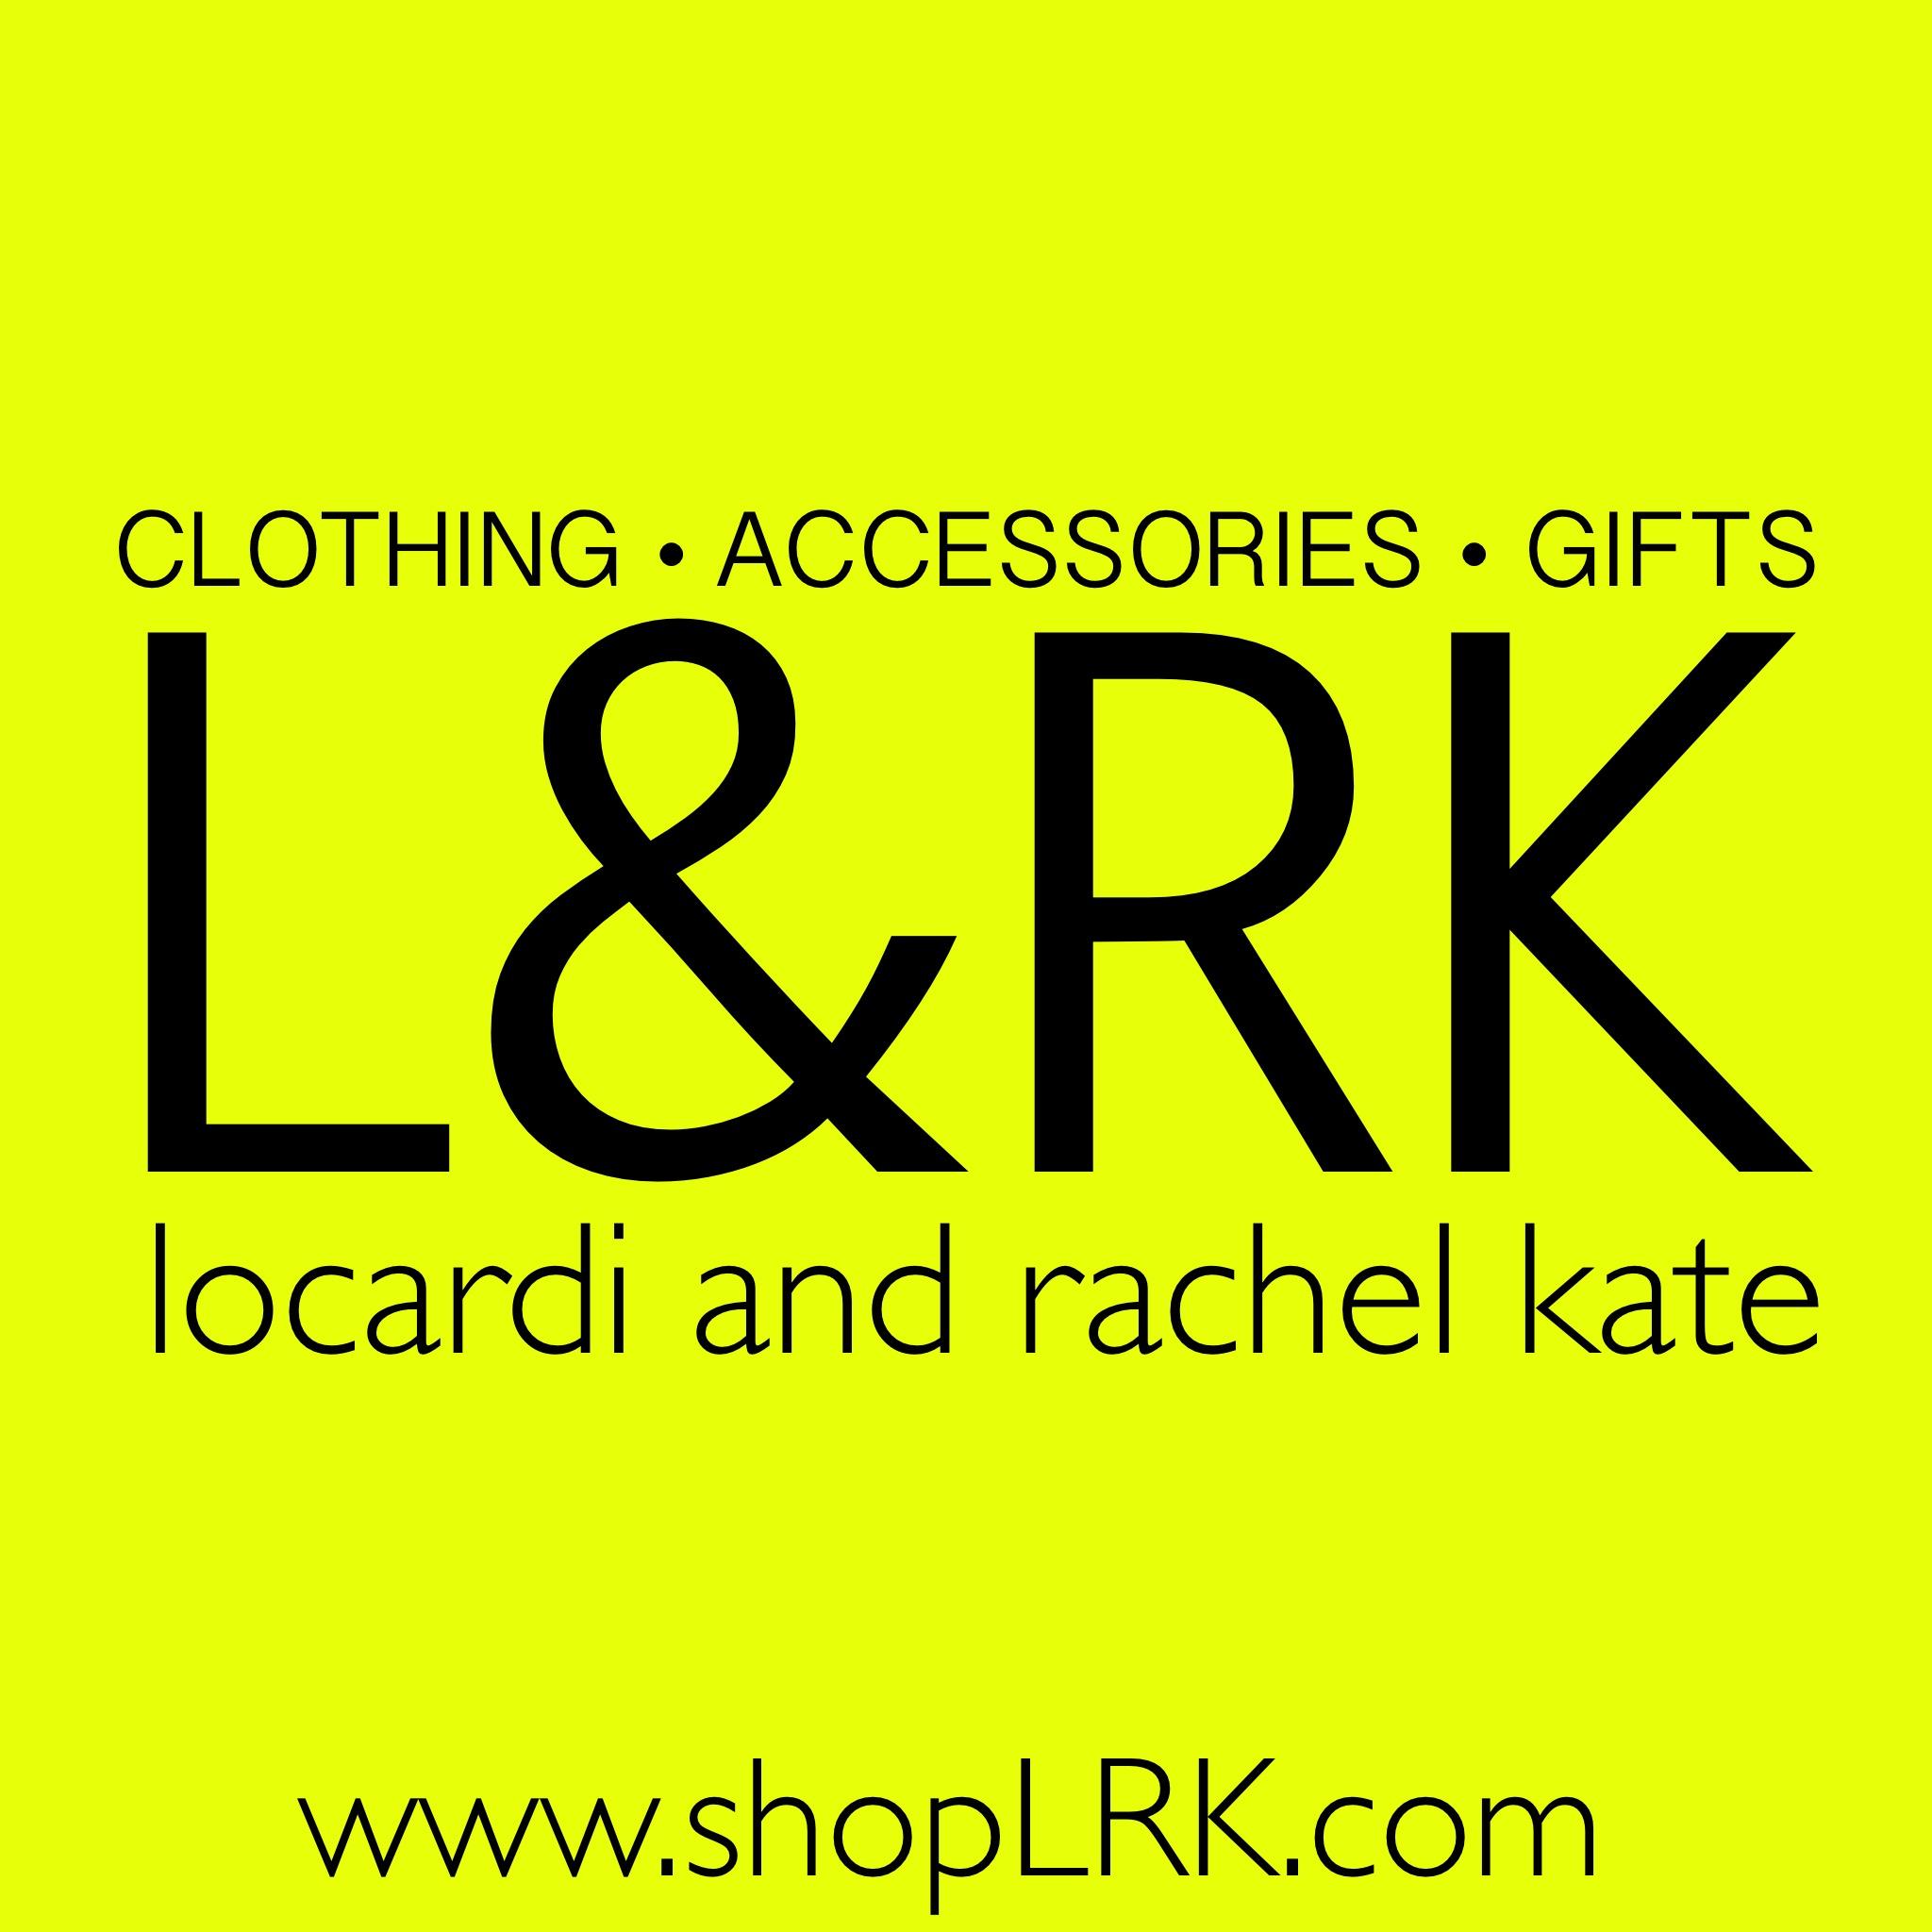 https://triumphoverkidcancer.org/wp-content/uploads/2015/07/LRK-Locardi-Rachel-Kate-LOGO.jpg